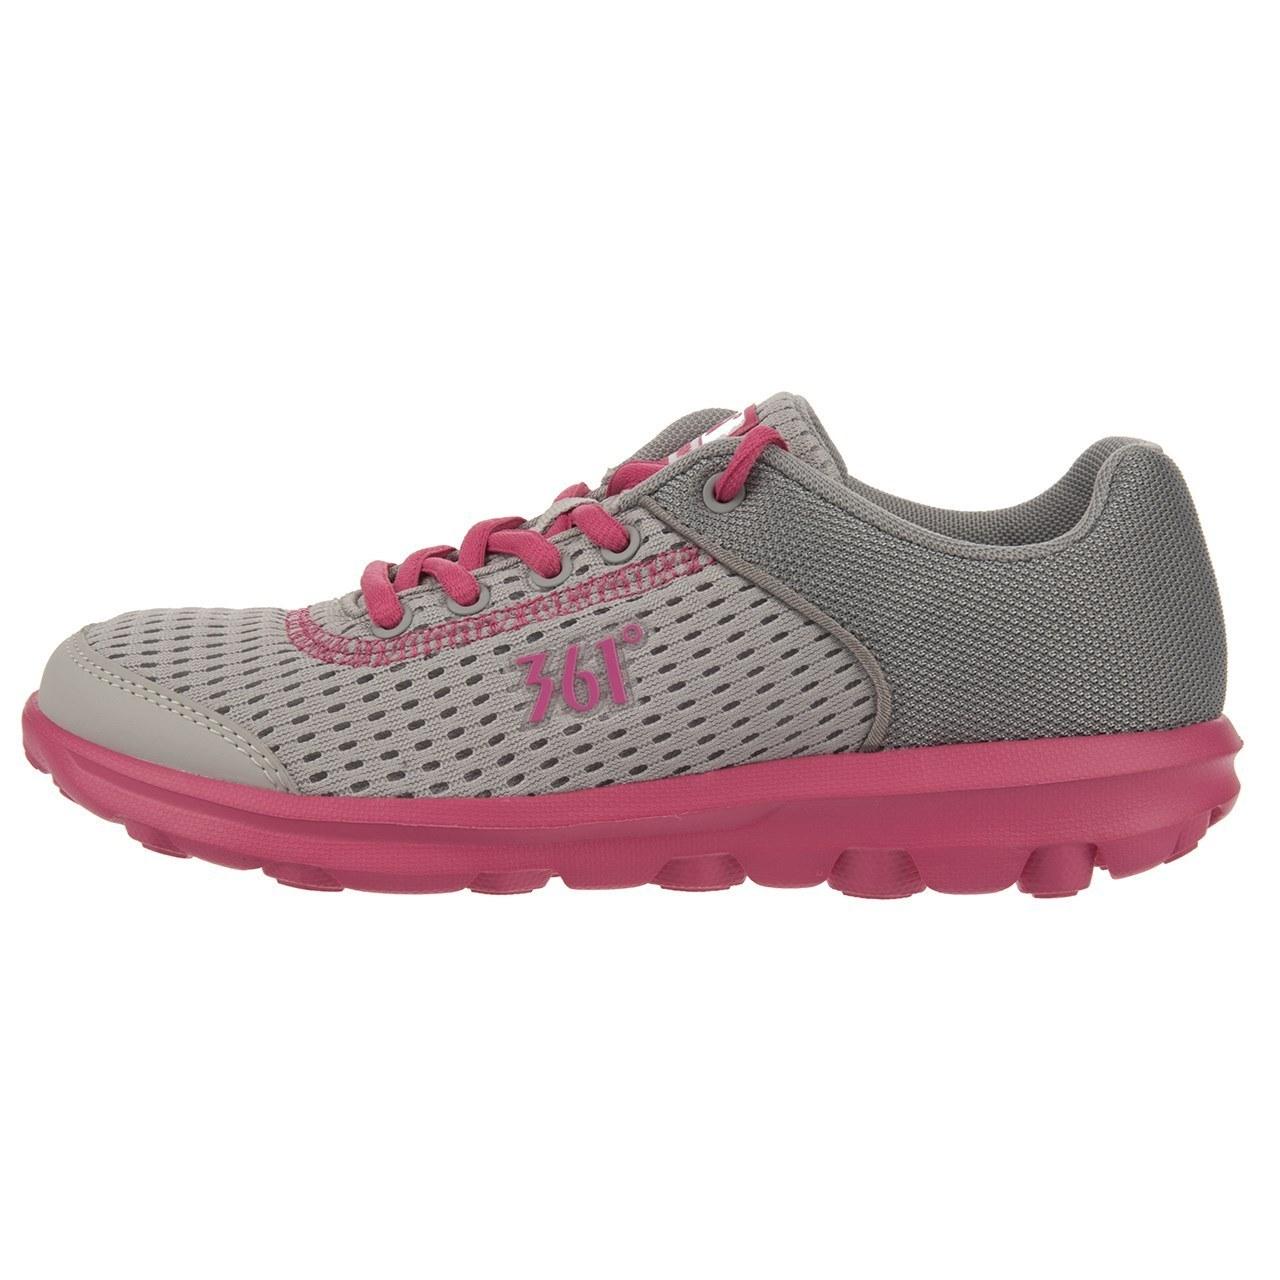 کفش مخصوص دويدن زنانه 361 درجه مدل 24414 | Model 24414 Running Shoes By 361 Degrees For Women